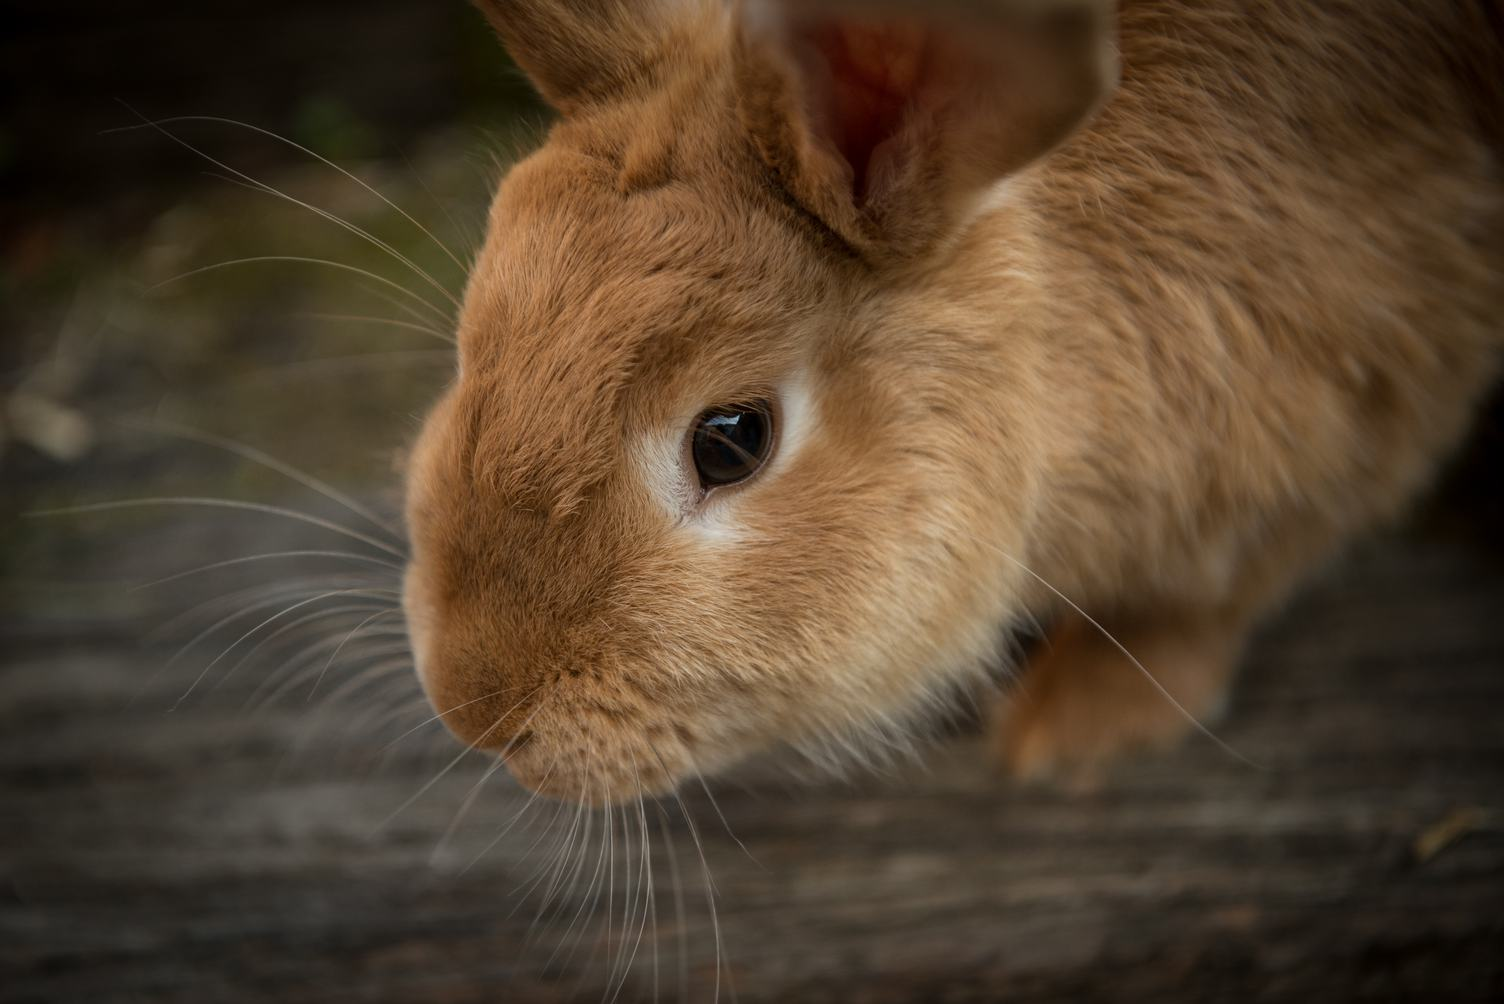 Brown Domestic Rabbit